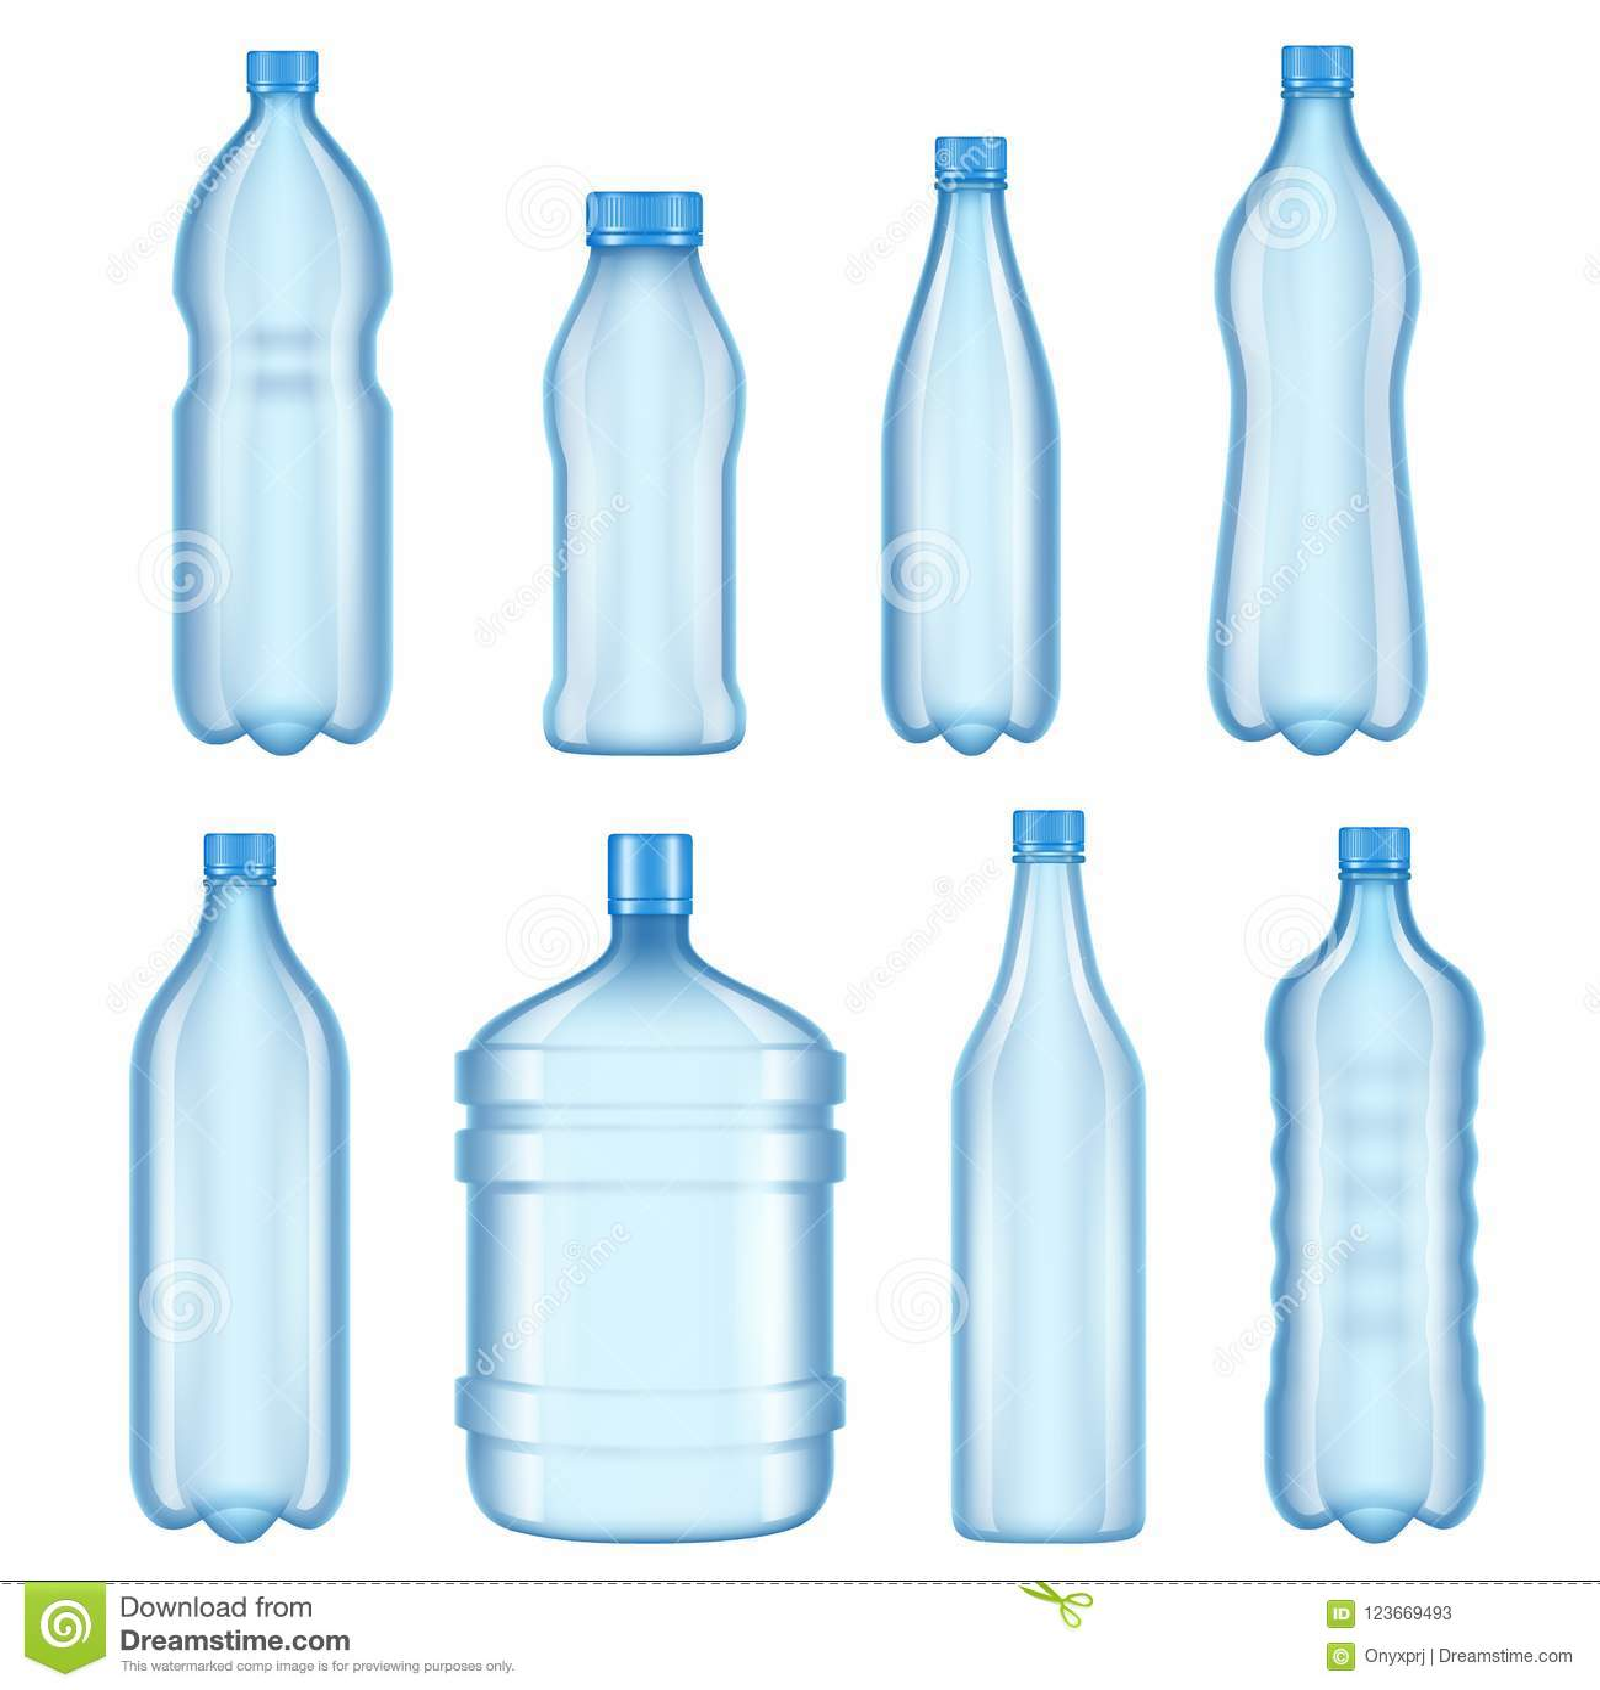 Transparent Plastic Bottles  Vector Illustrations Of Bottles